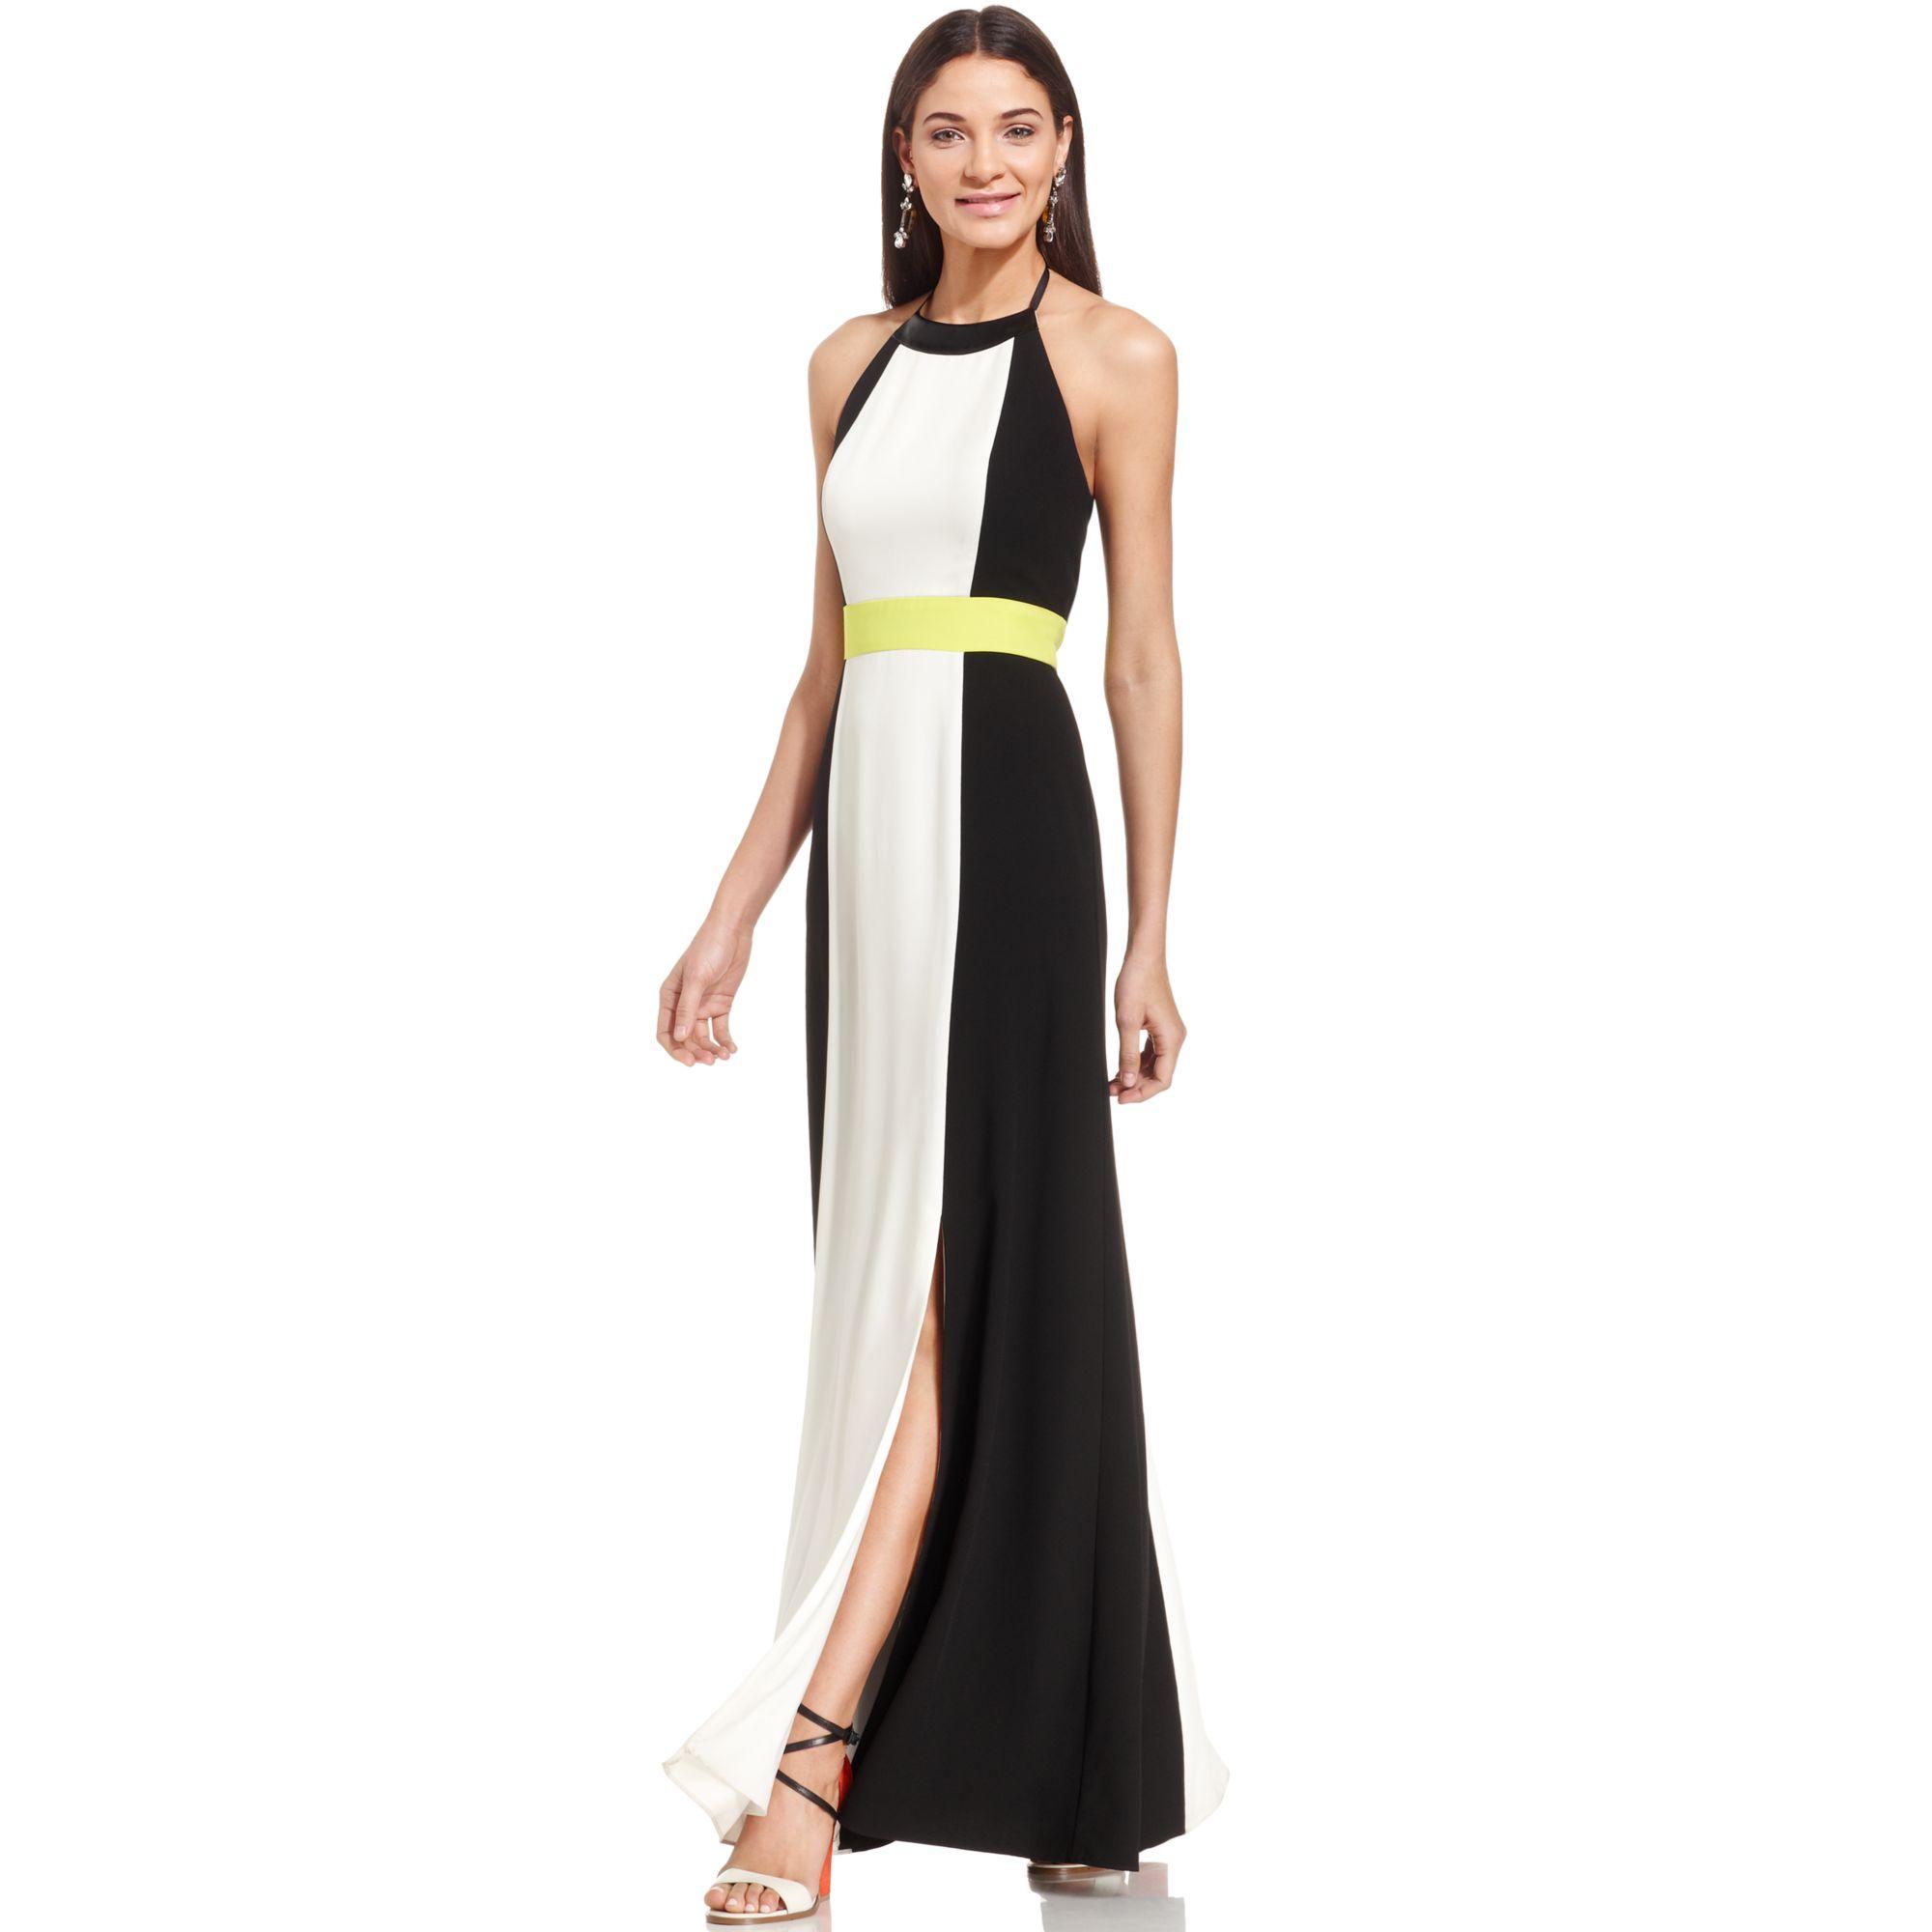 e25c063b8446f Lyst - Vince Camuto Colorblock Halter Maxi Dress in Black